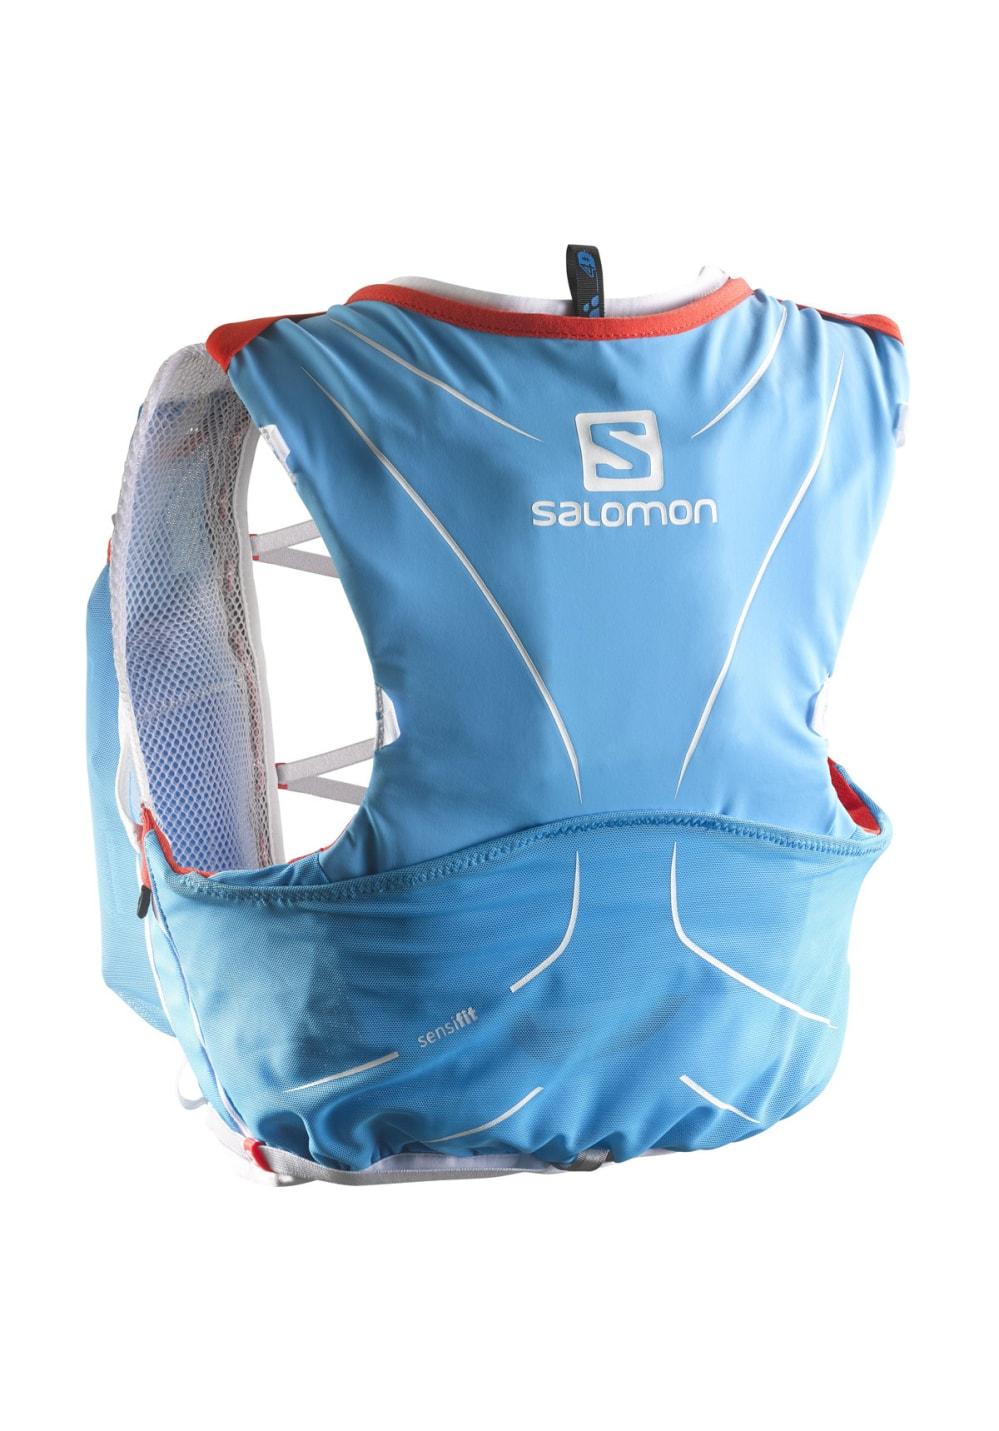 68b75728 Salomon S-Lab Adv Skin3 5 Set - Backpacks - Blue